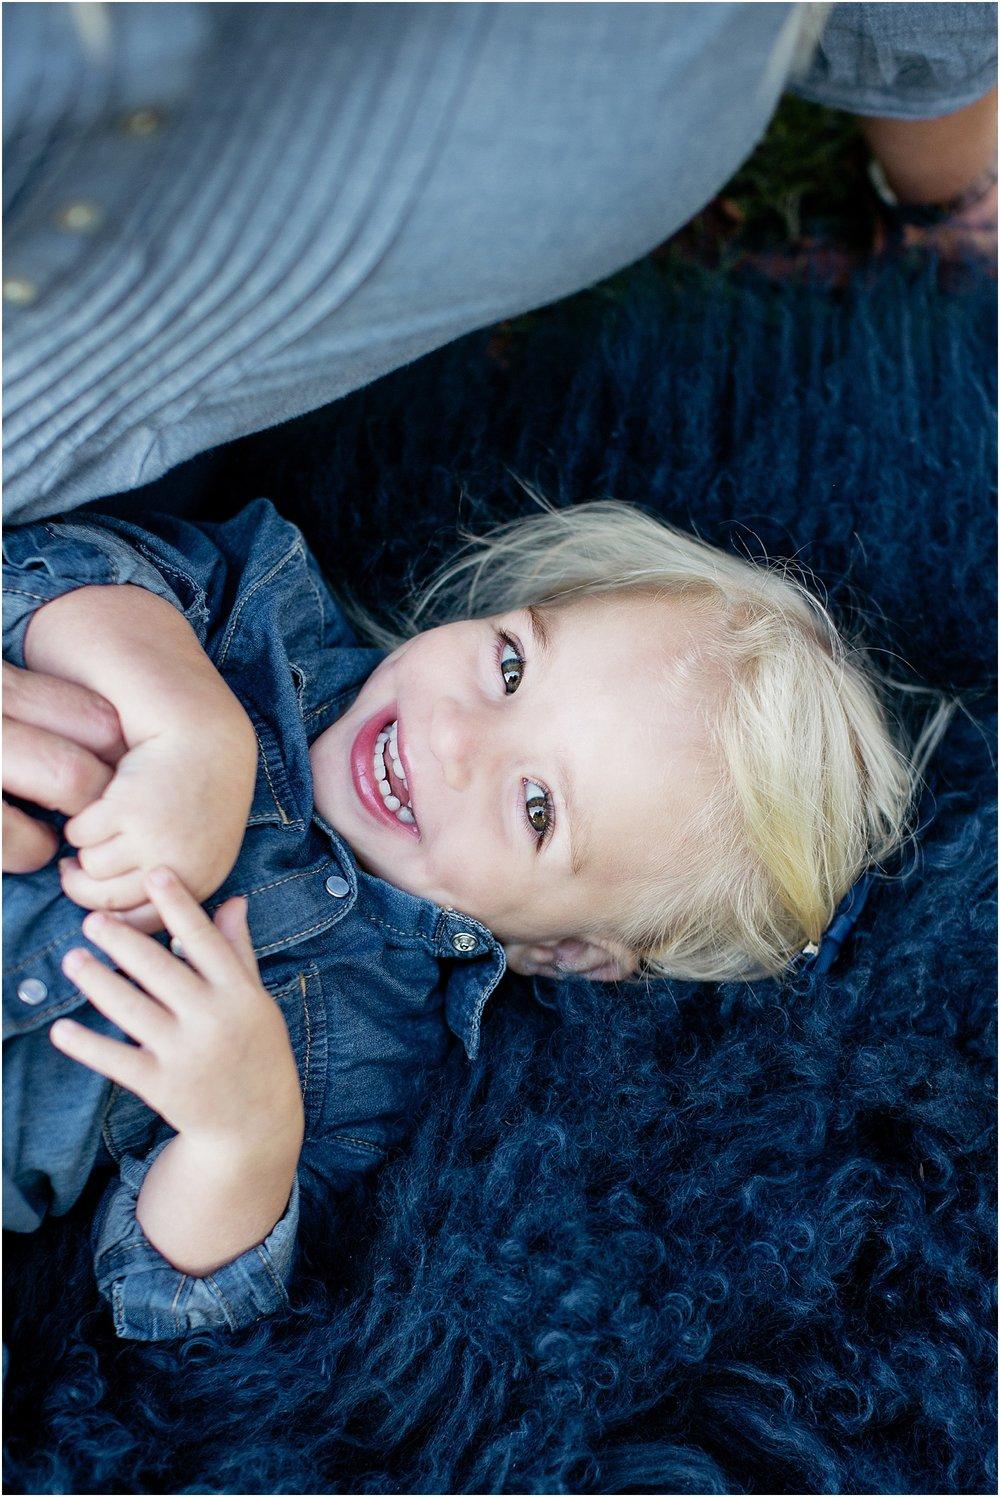 Kinderfotografie-ludwigsburg-fotograf-karoline-kirchhof-herbst-monrepos_0116.jpg